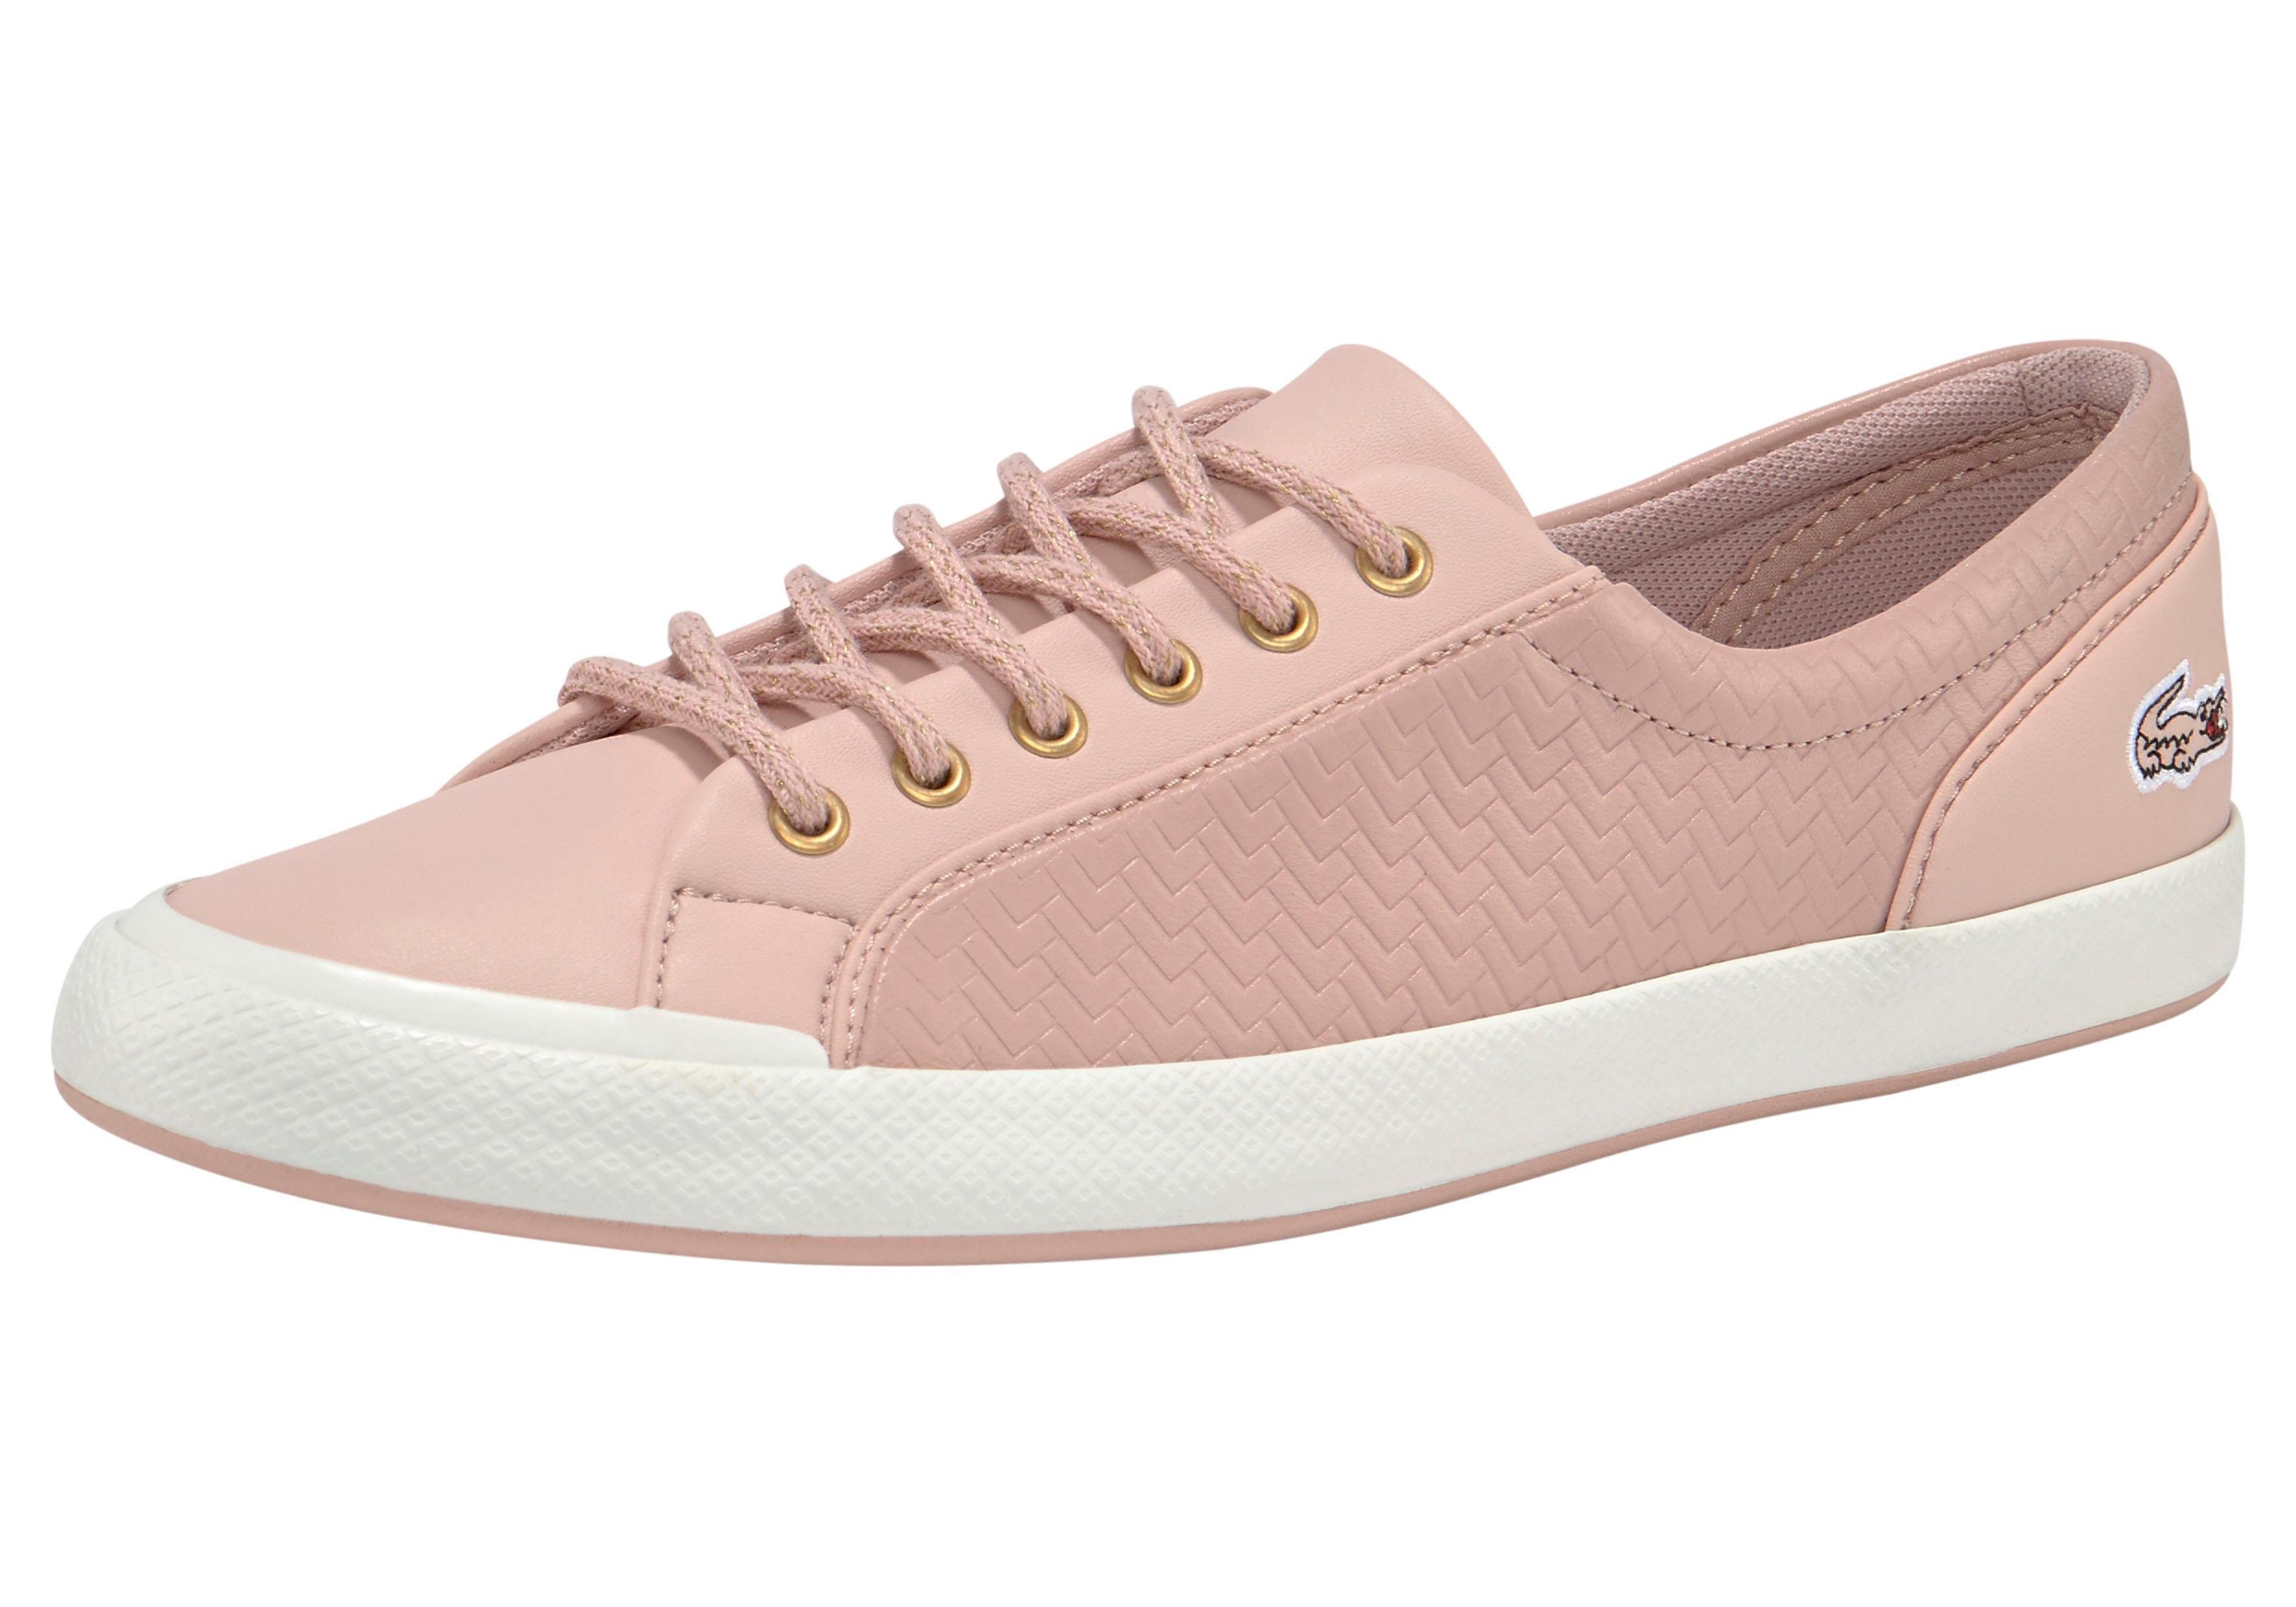 LACOSTE sneakers »LANCELLE SNEAKER 1191CFA« nu online kopen bij OTTO